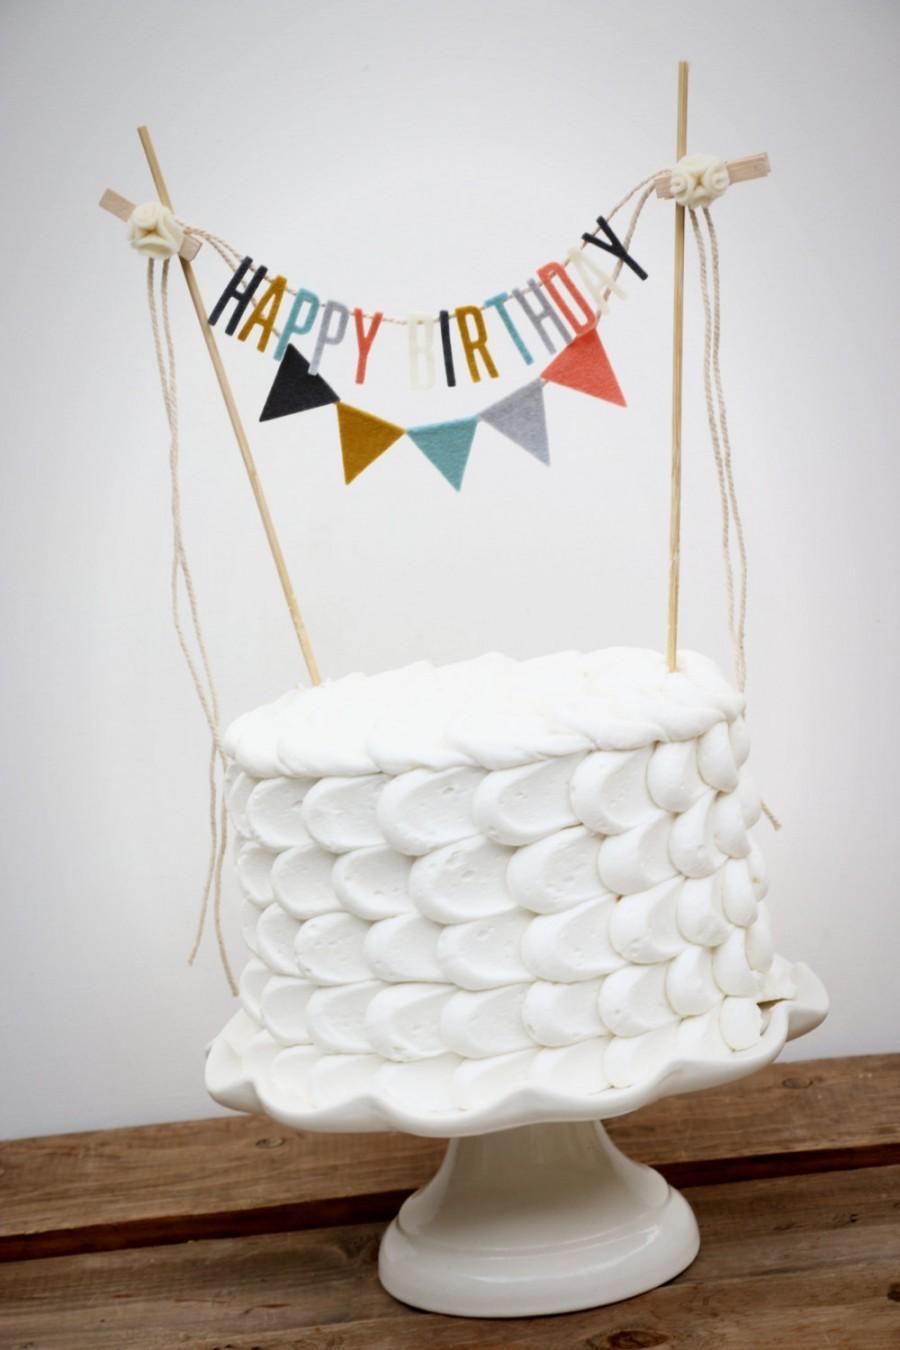 Свадьба - Personalized Cake Banner, Birthday Cake Banner, Custom Cake Banner, Custom Cake Garland, Personalized Cake Garland